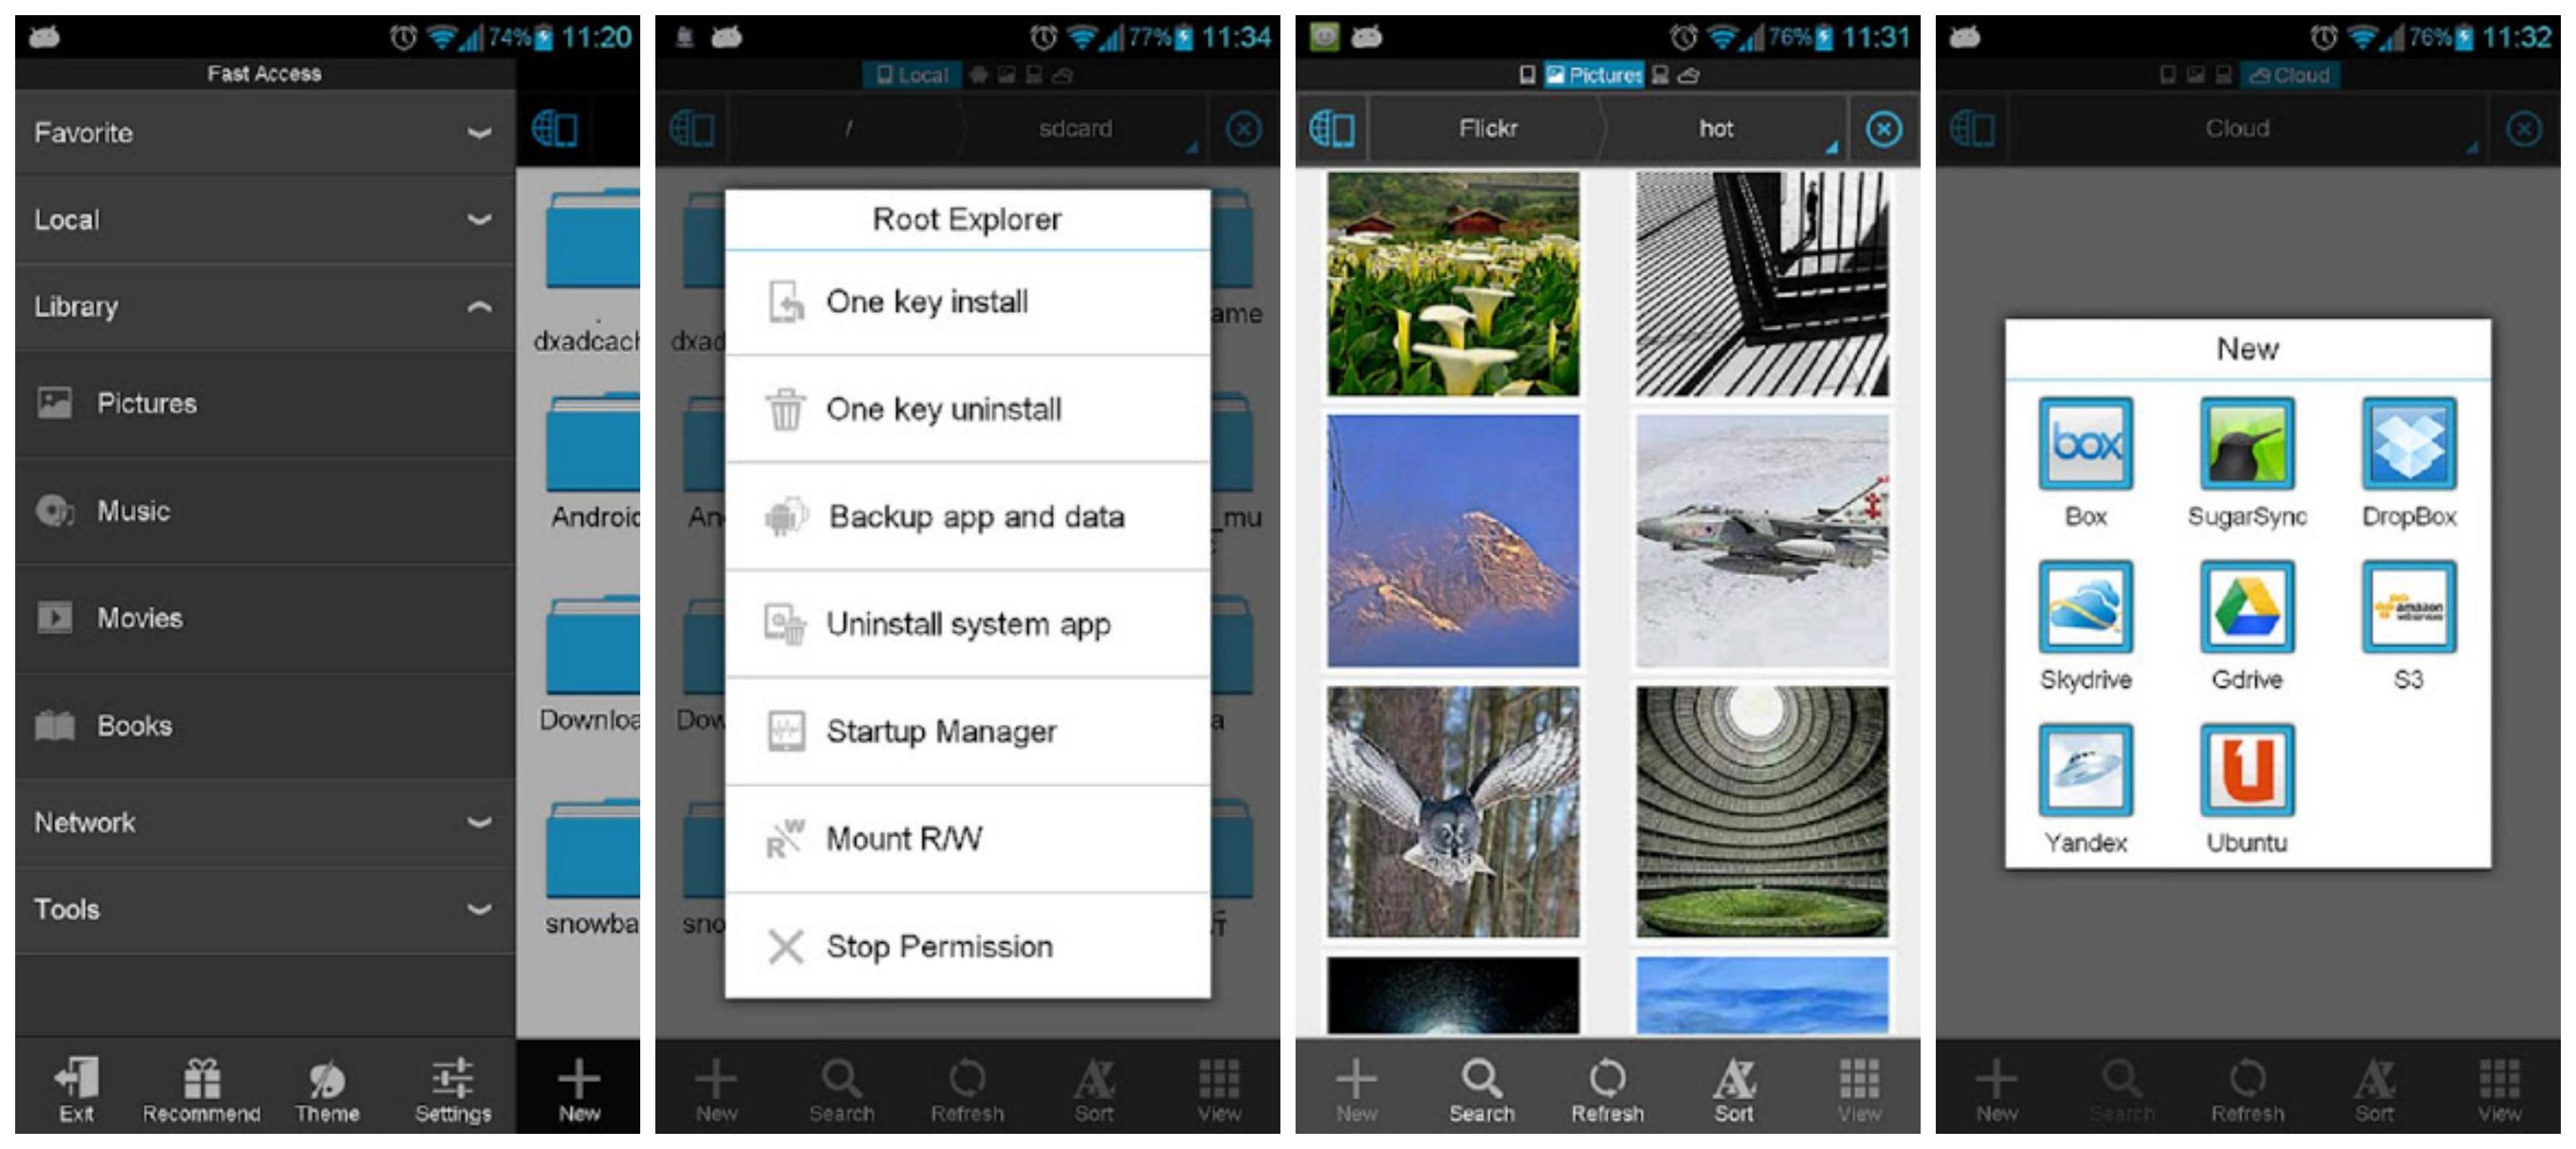 Google themes explorer - Es File Explorer 3 Now Available In Public Test Version Via Google Play